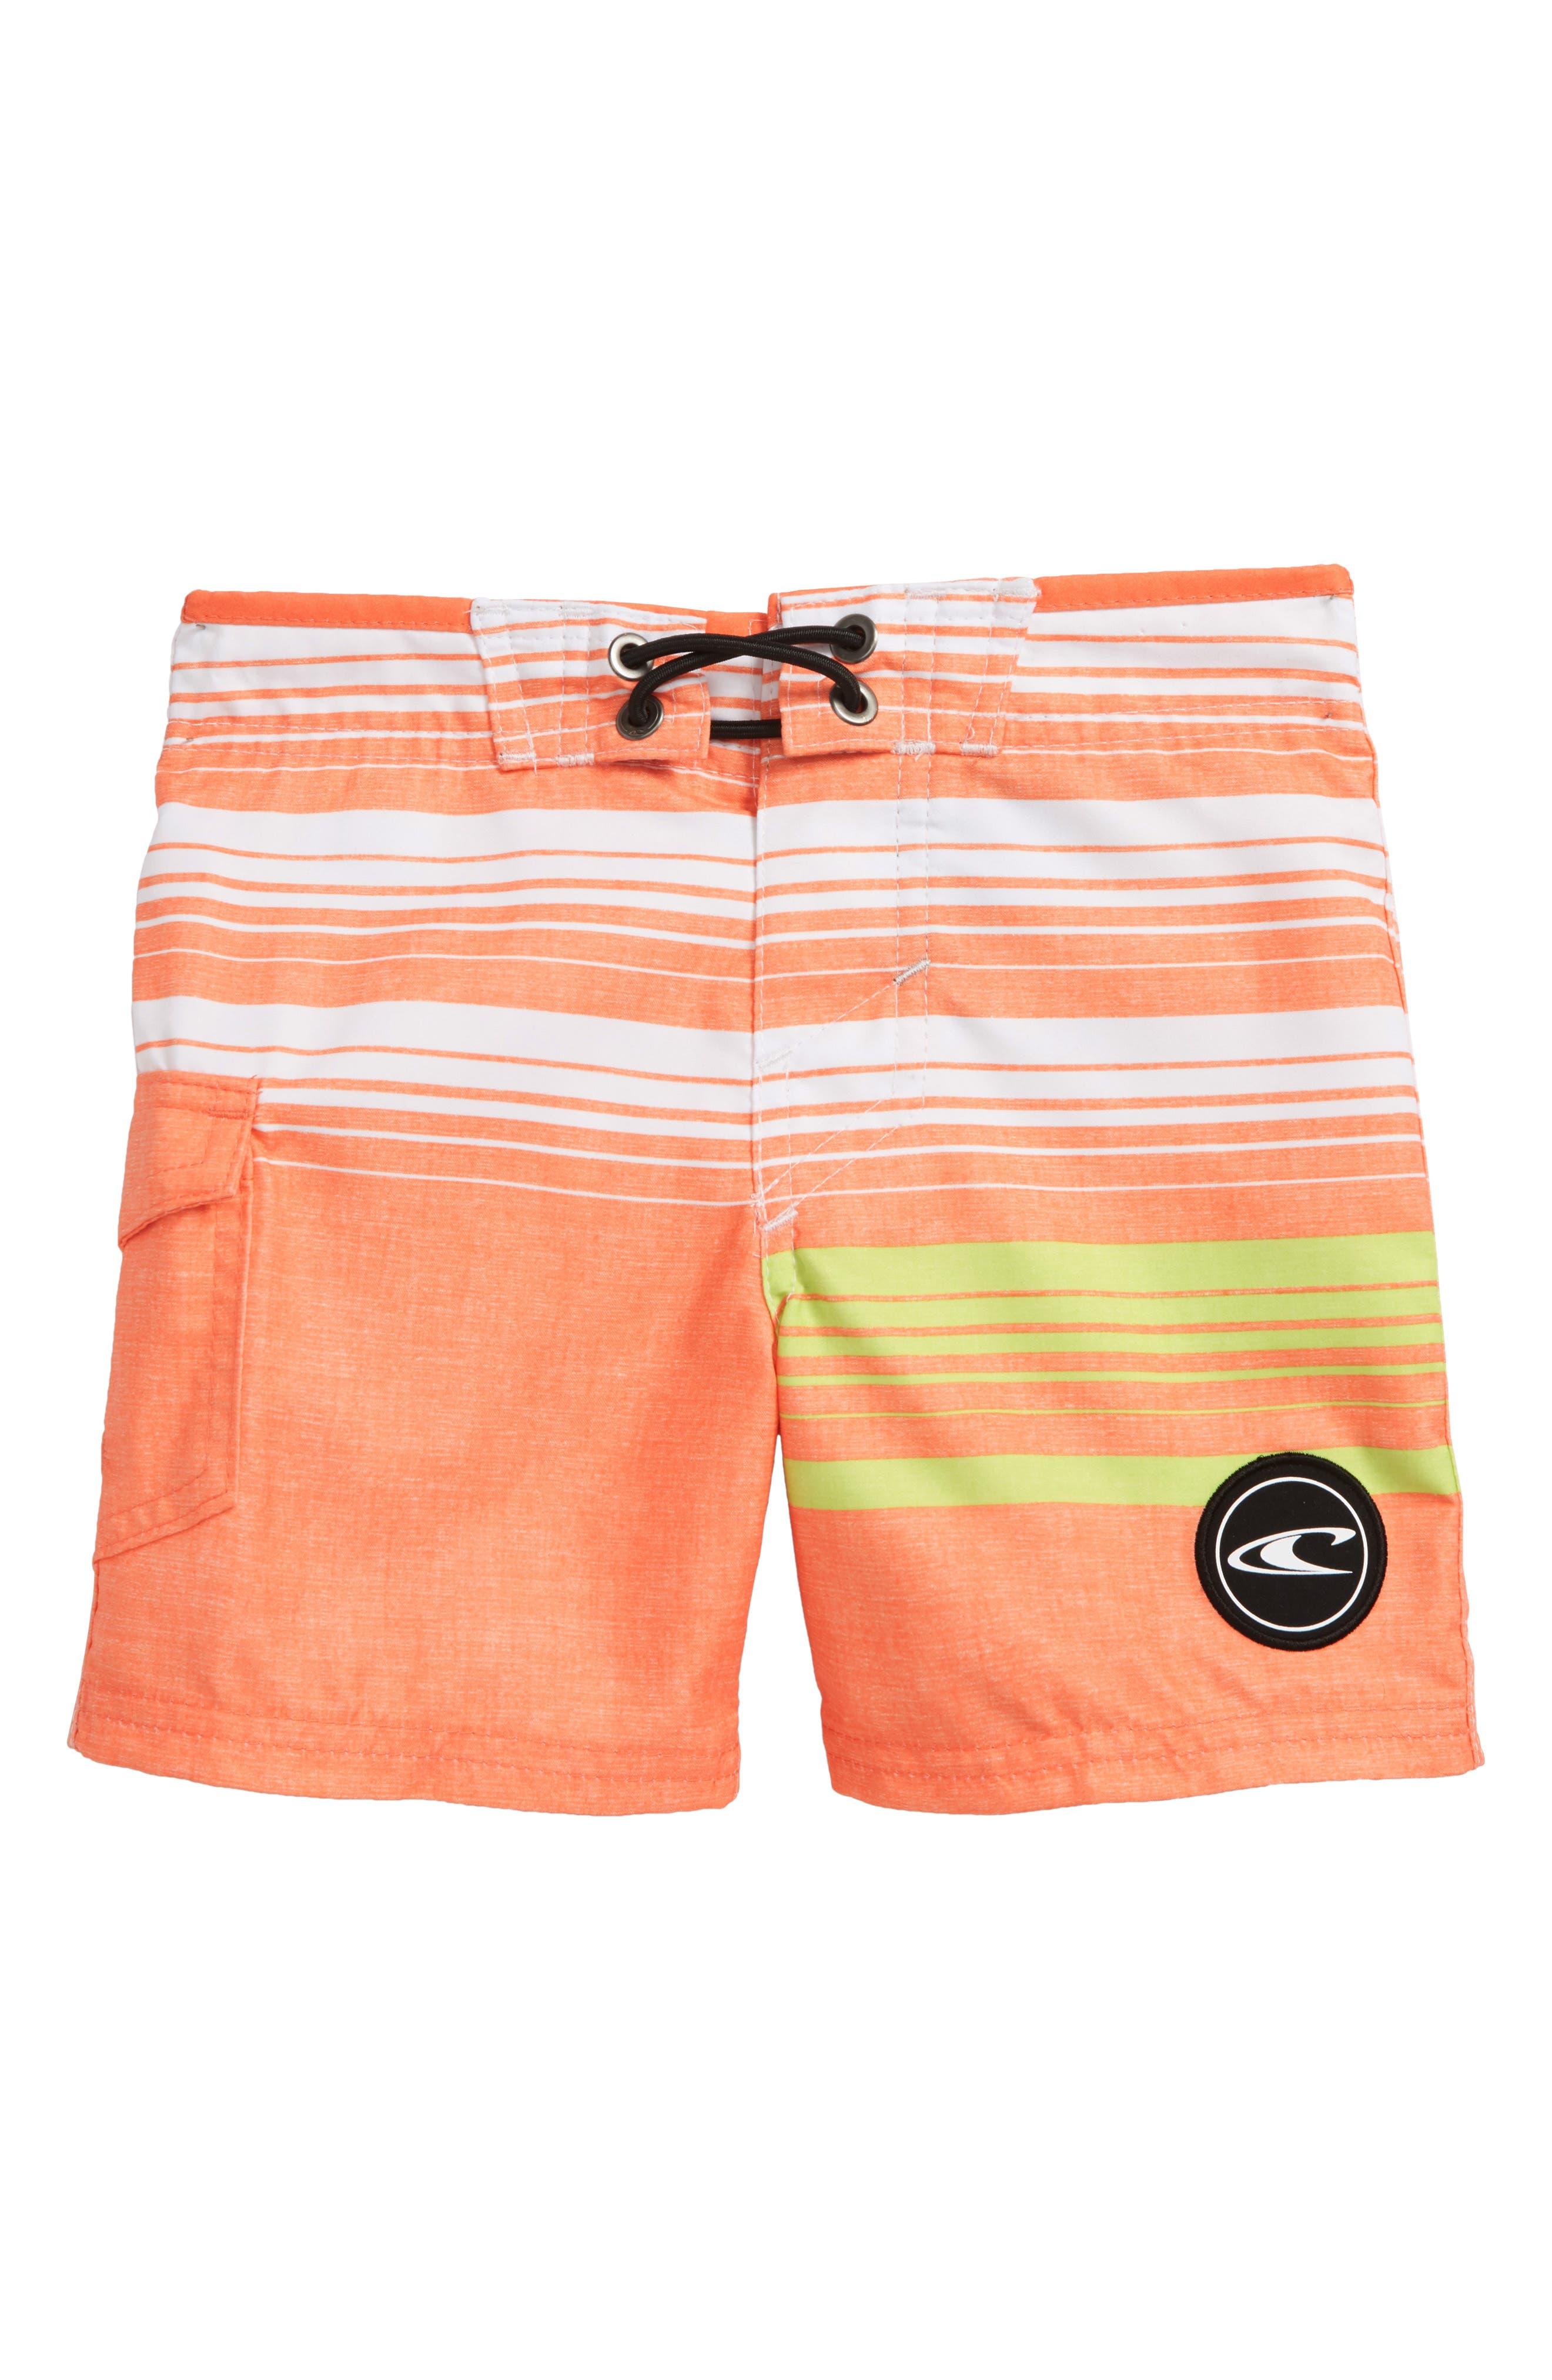 Bennett Board Shorts,                             Main thumbnail 3, color,